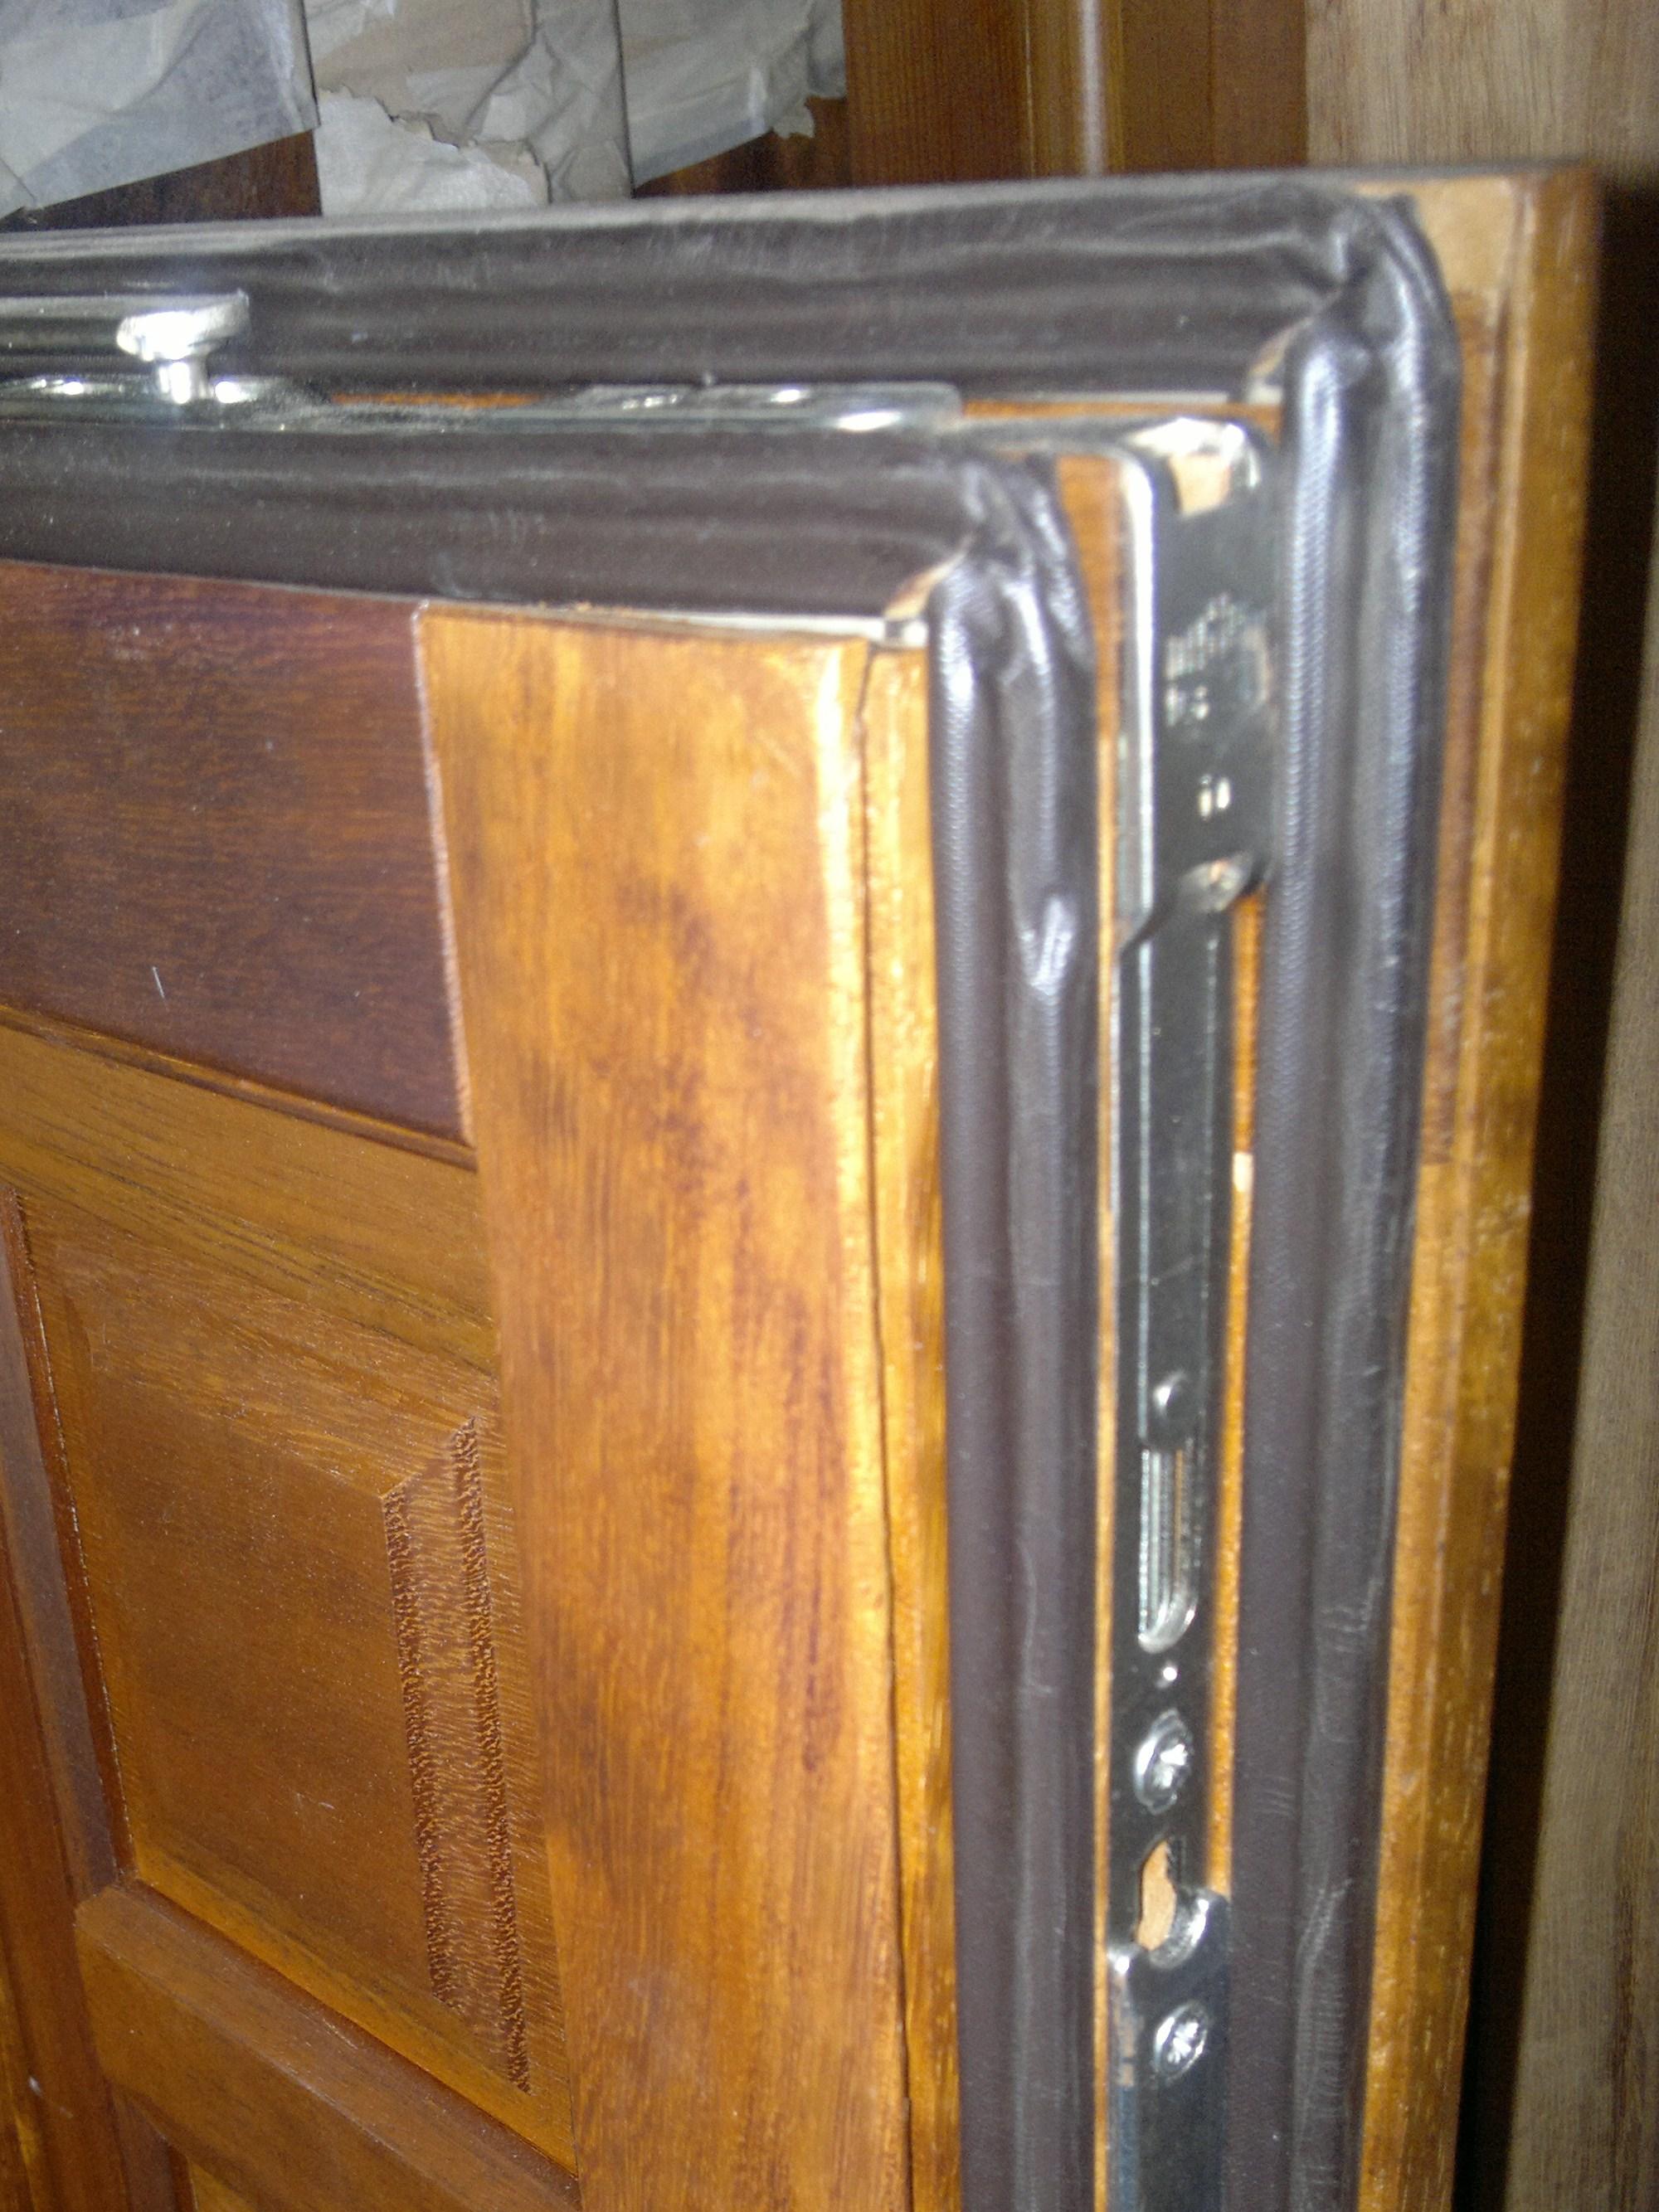 Blog Carpinteria Bacigalupe - Página 3 de 3 - Carpintería, puertas ...